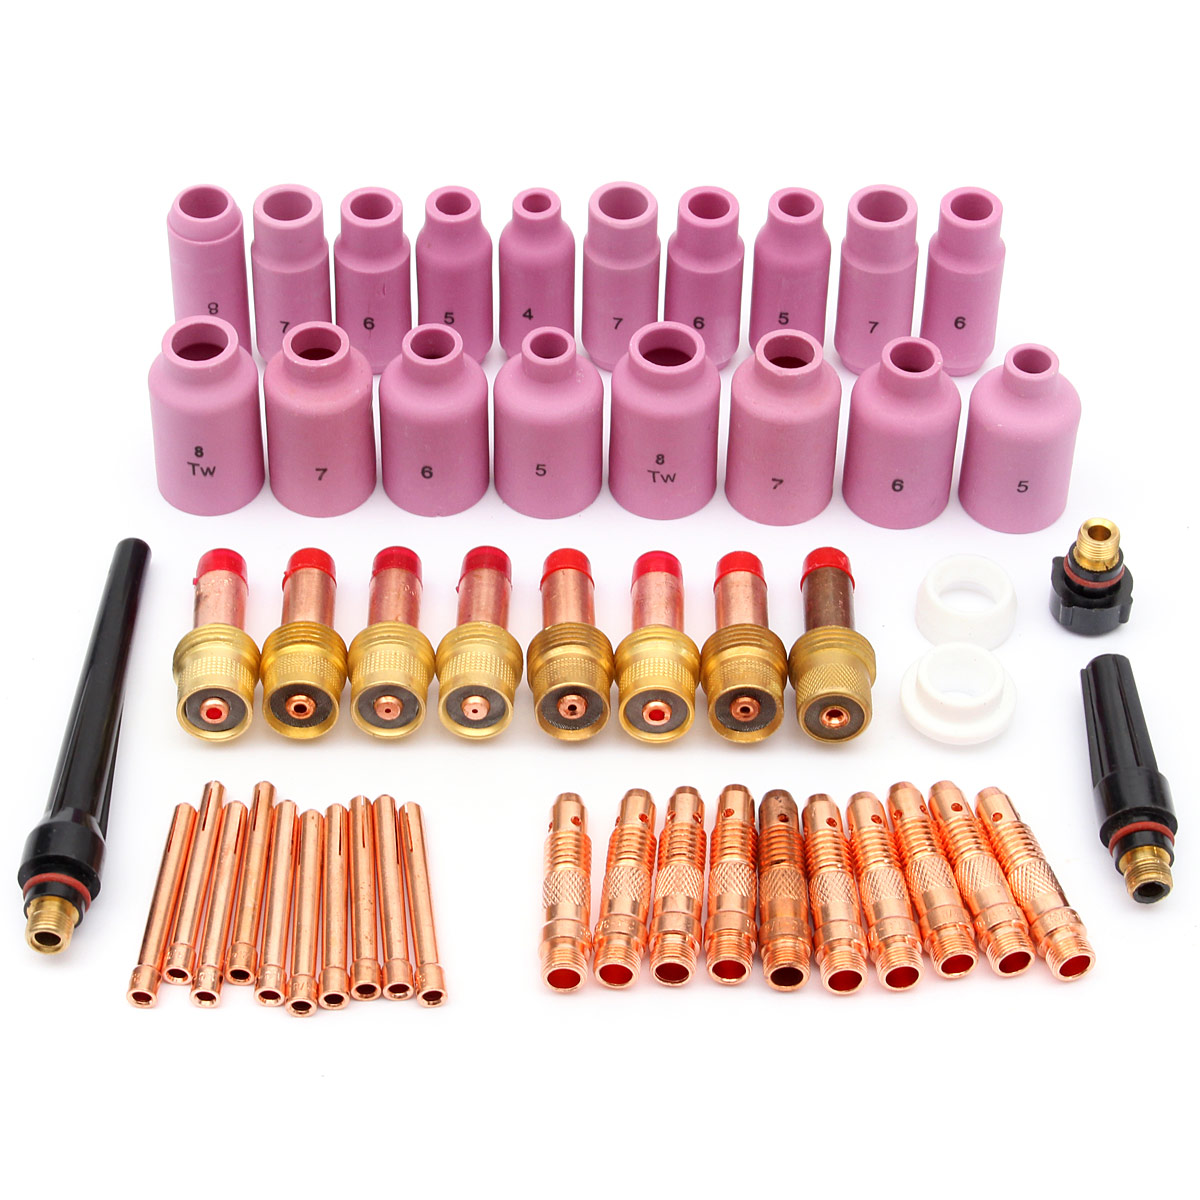 51pcs/set Durable TIG Welding Torch Accessories Consumables FIT WP 17 18 26 Series Gas Lens Nozzles Welding Accessories|Welding Torches|Tools - title=